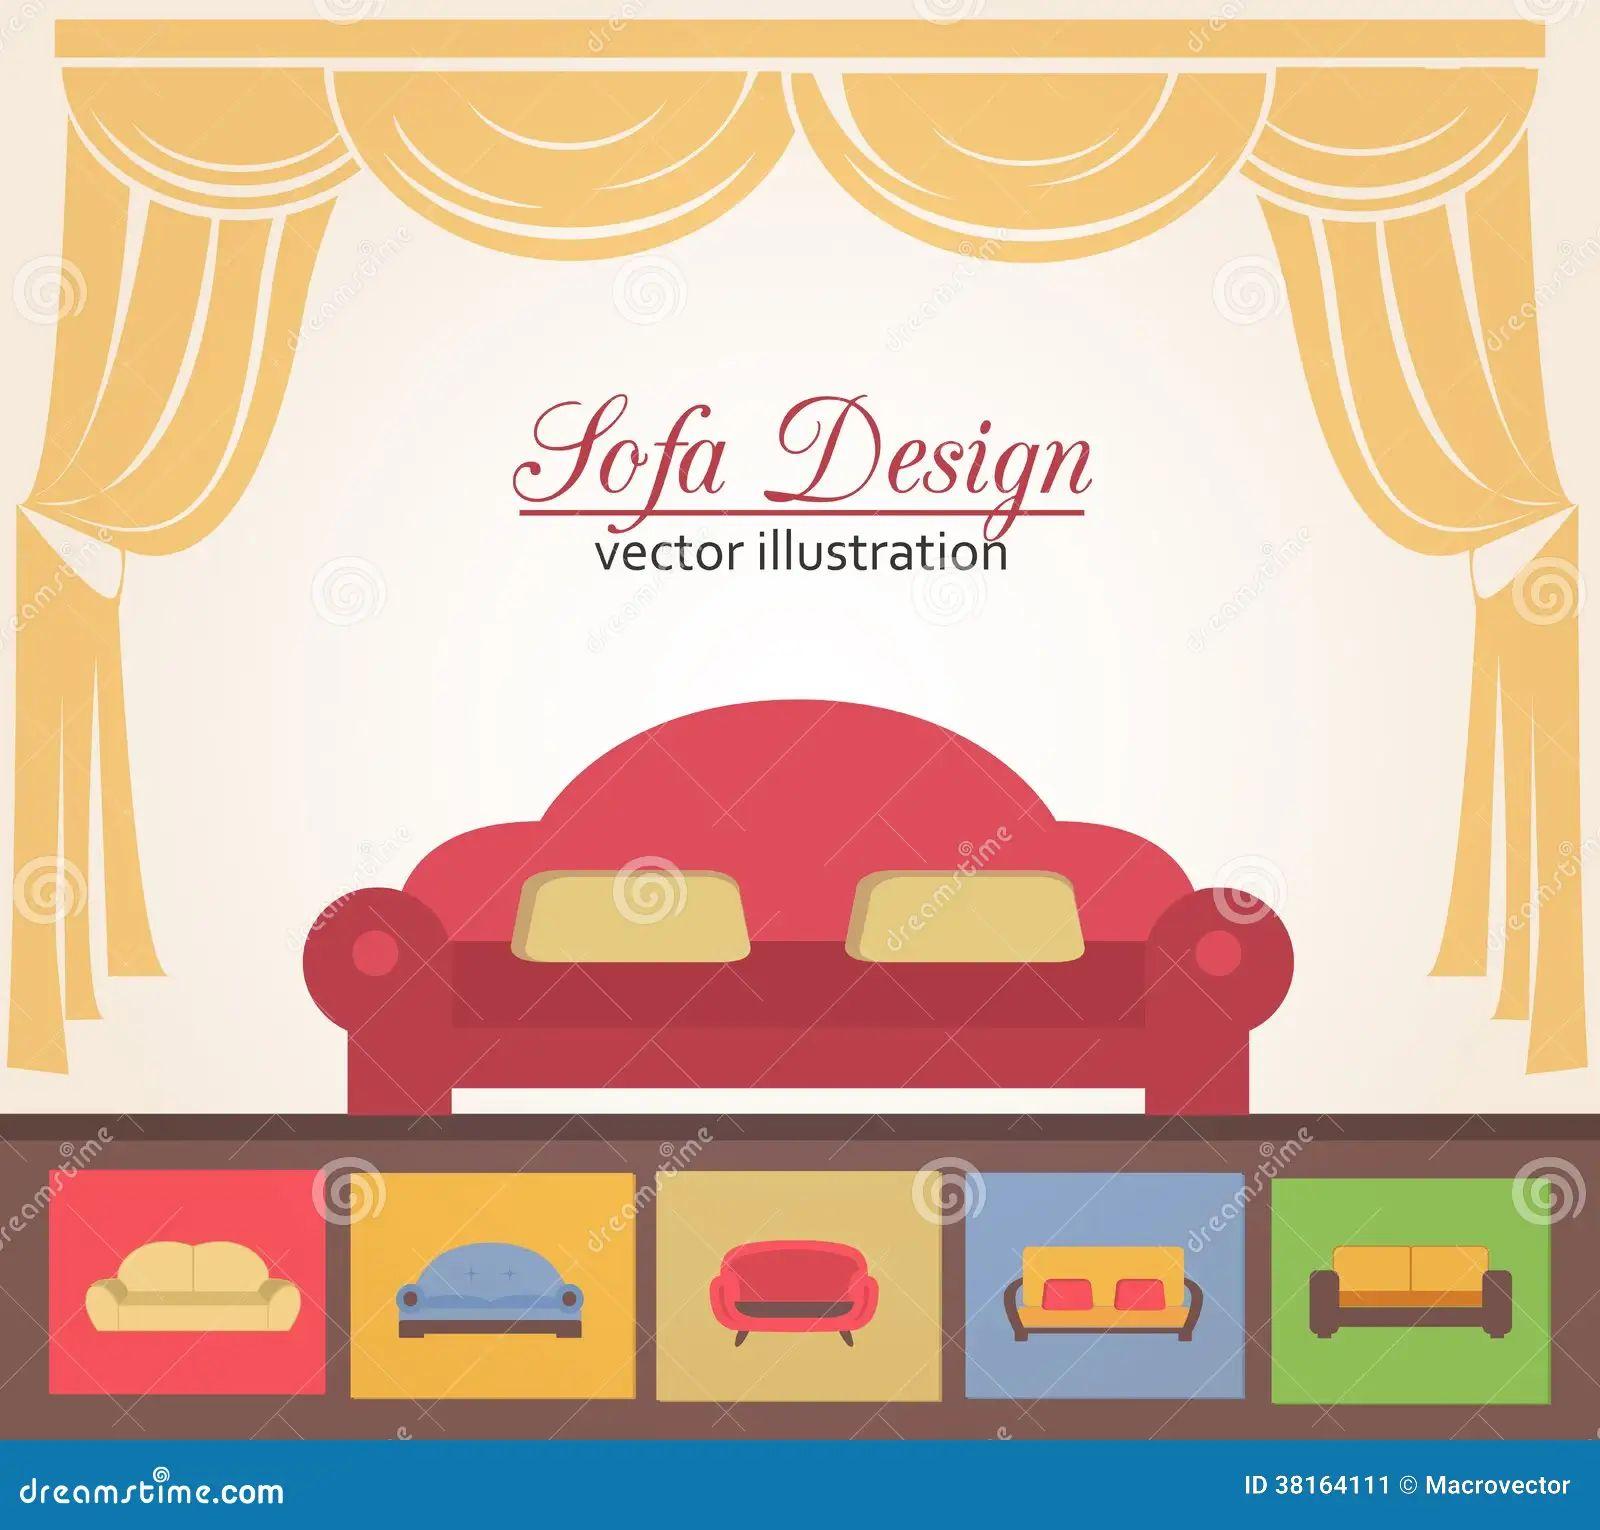 Elements of a poster design -  Design Poster Elements Download